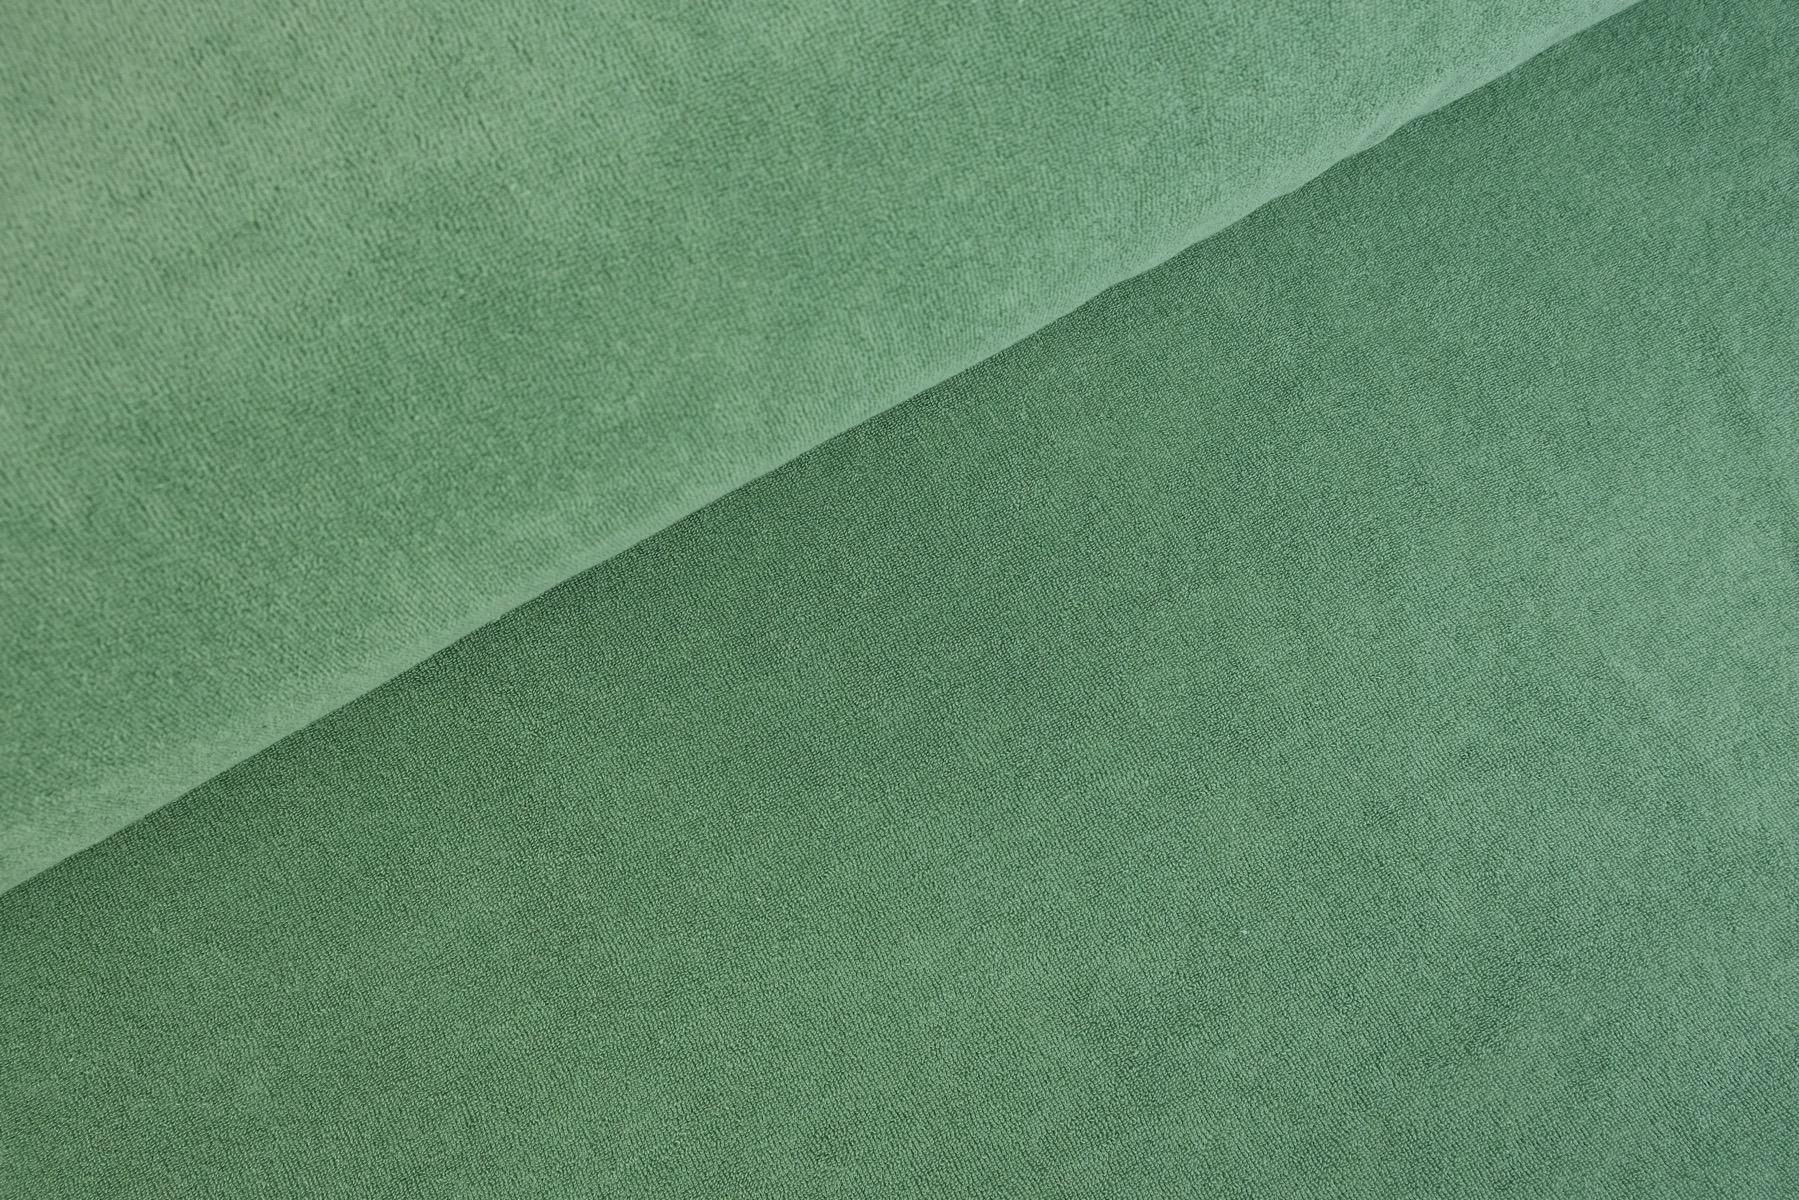 Rekbare Badstof / Spons Groen